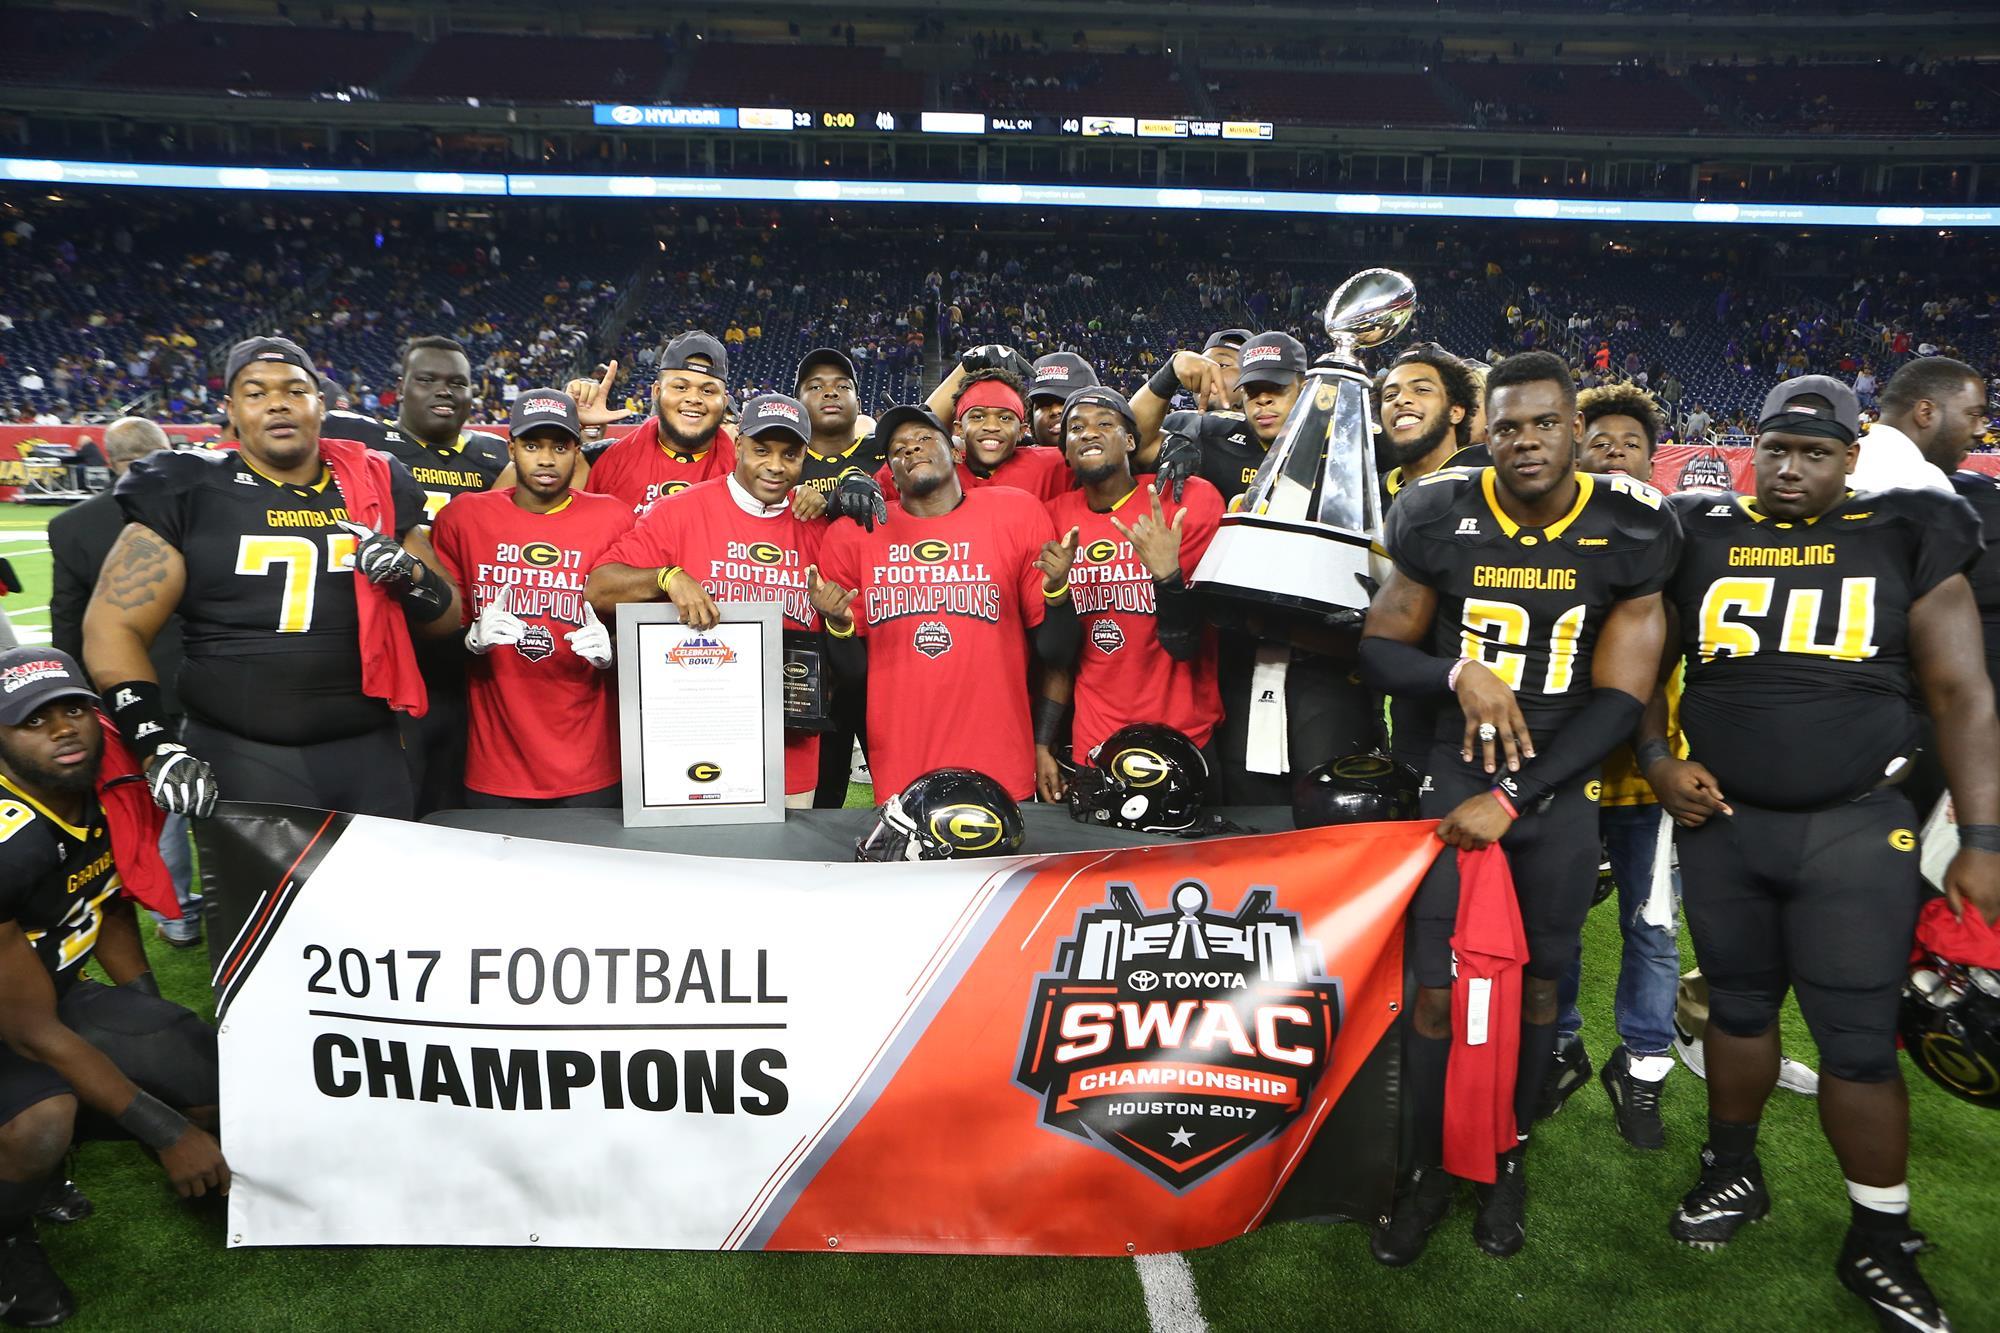 Tigers capture second consecutive SWAC Championship